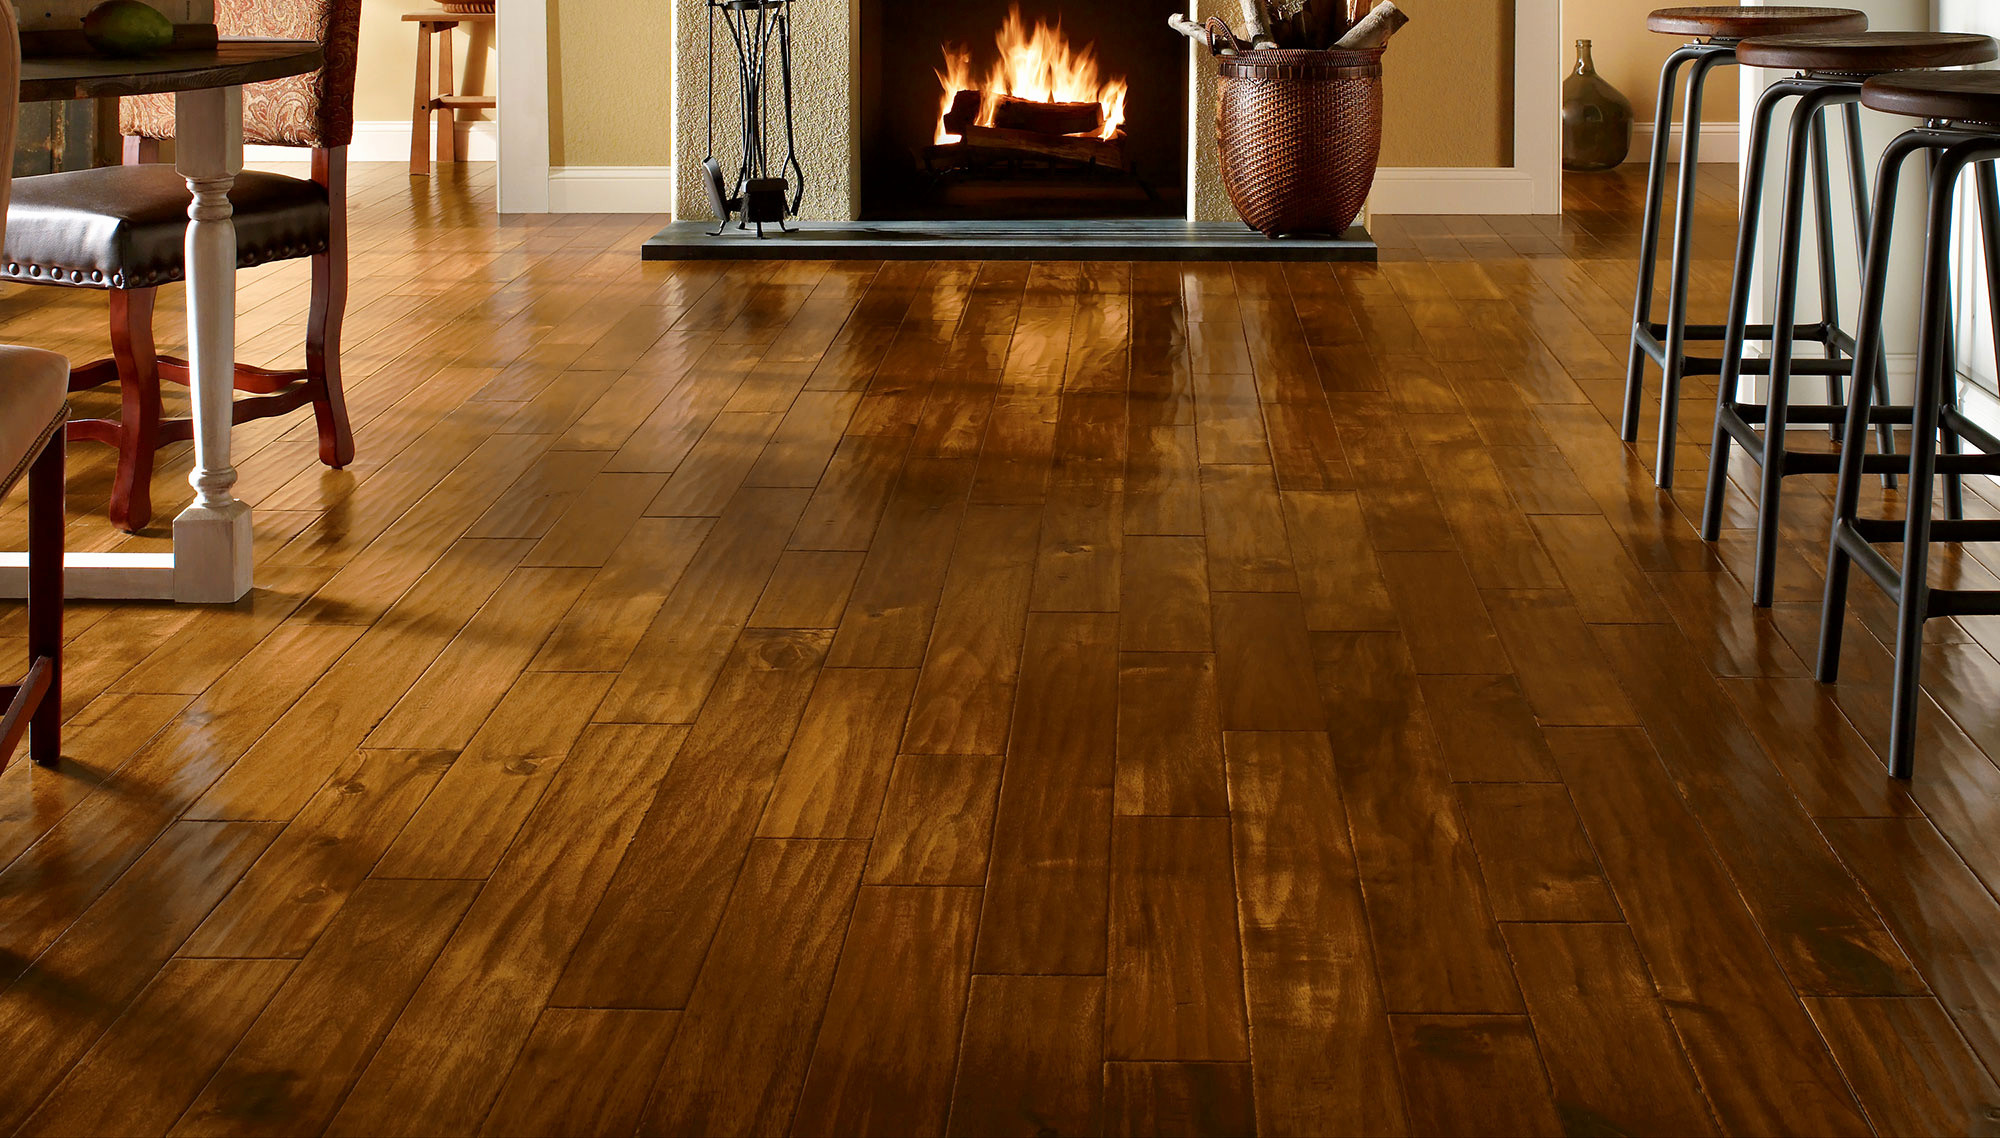 best canadian hardwood flooring manufacturers of hardwoodfloor low voc canada archives wlcu inside hardwood